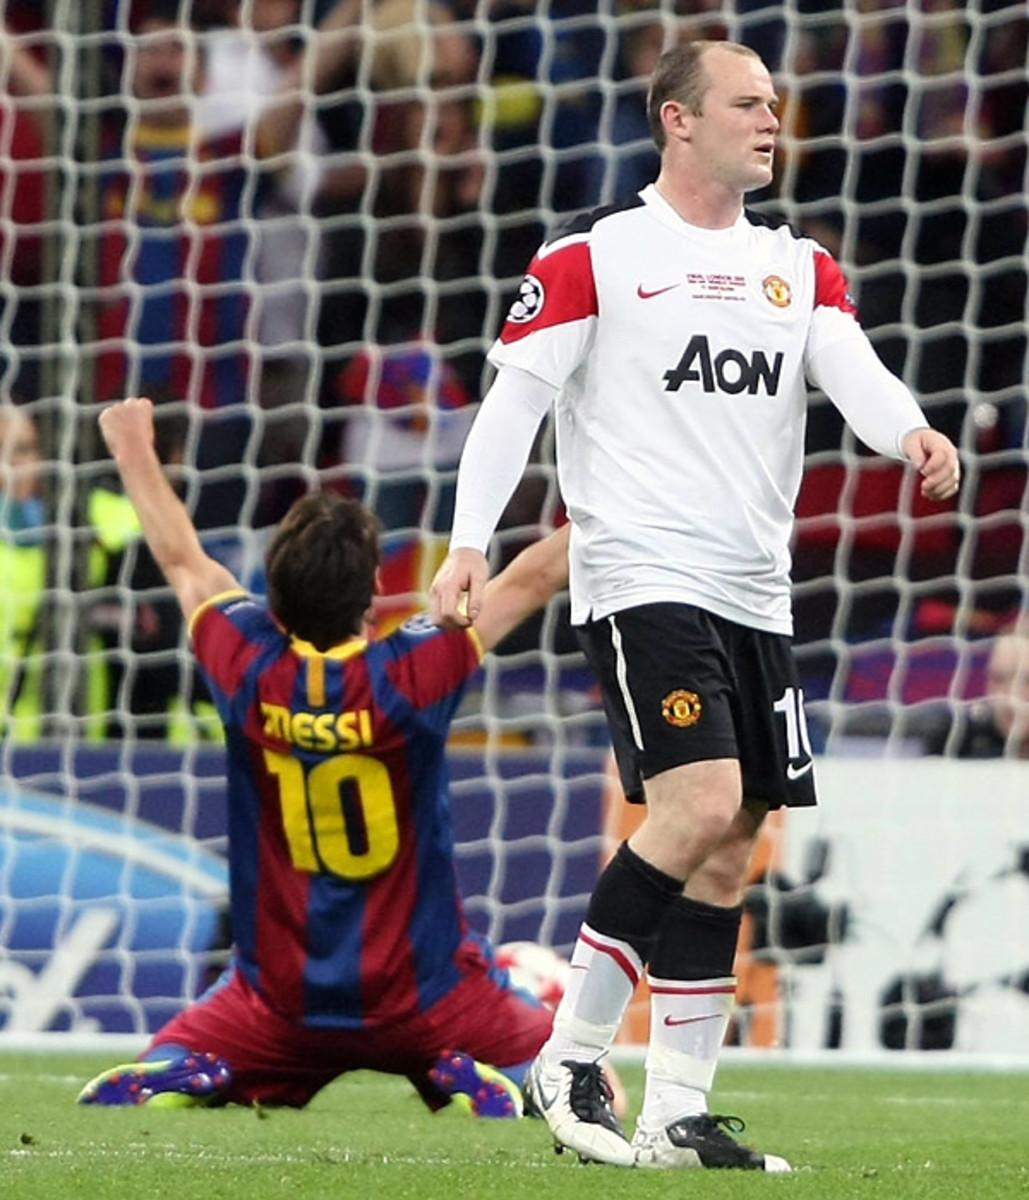 Barcelona 3, United 1